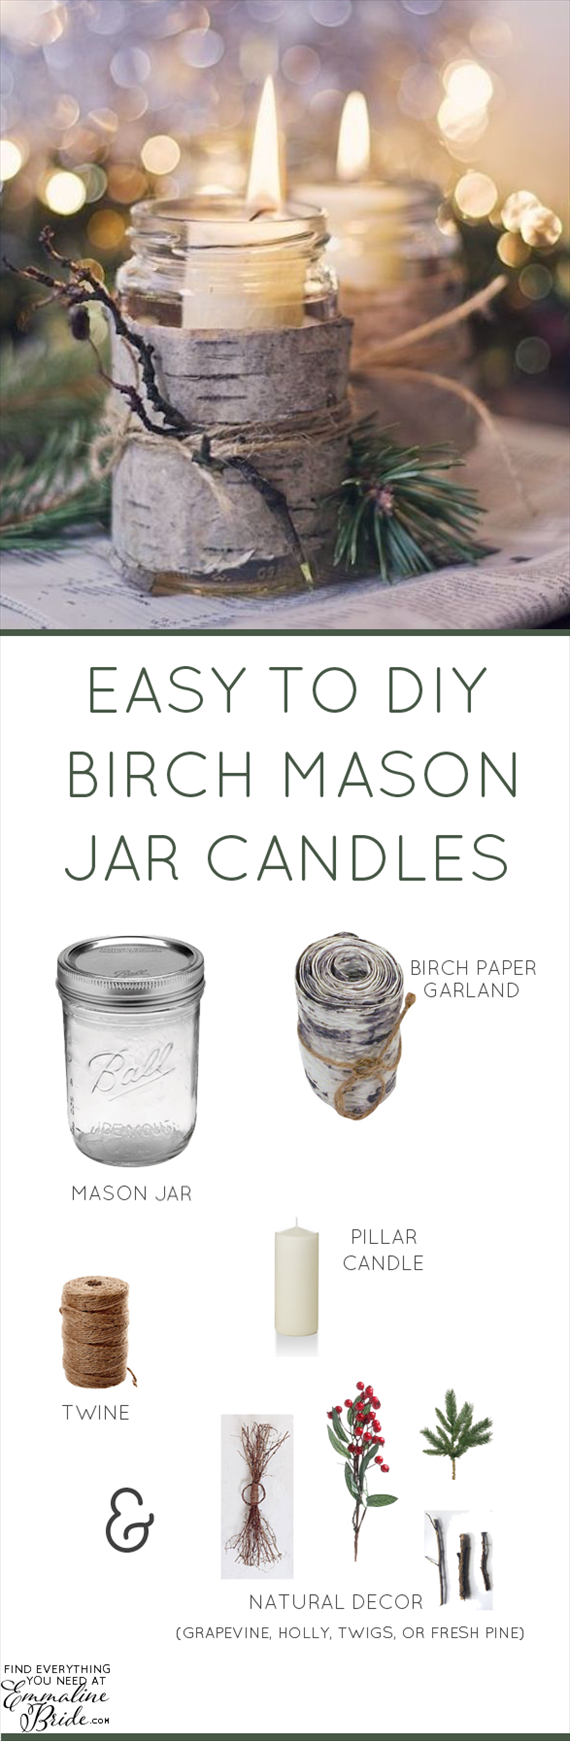 How to Make DIY Birch Mason Jar Candles | https://emmalinebride.com/reception/birch-mason-jar-candles/